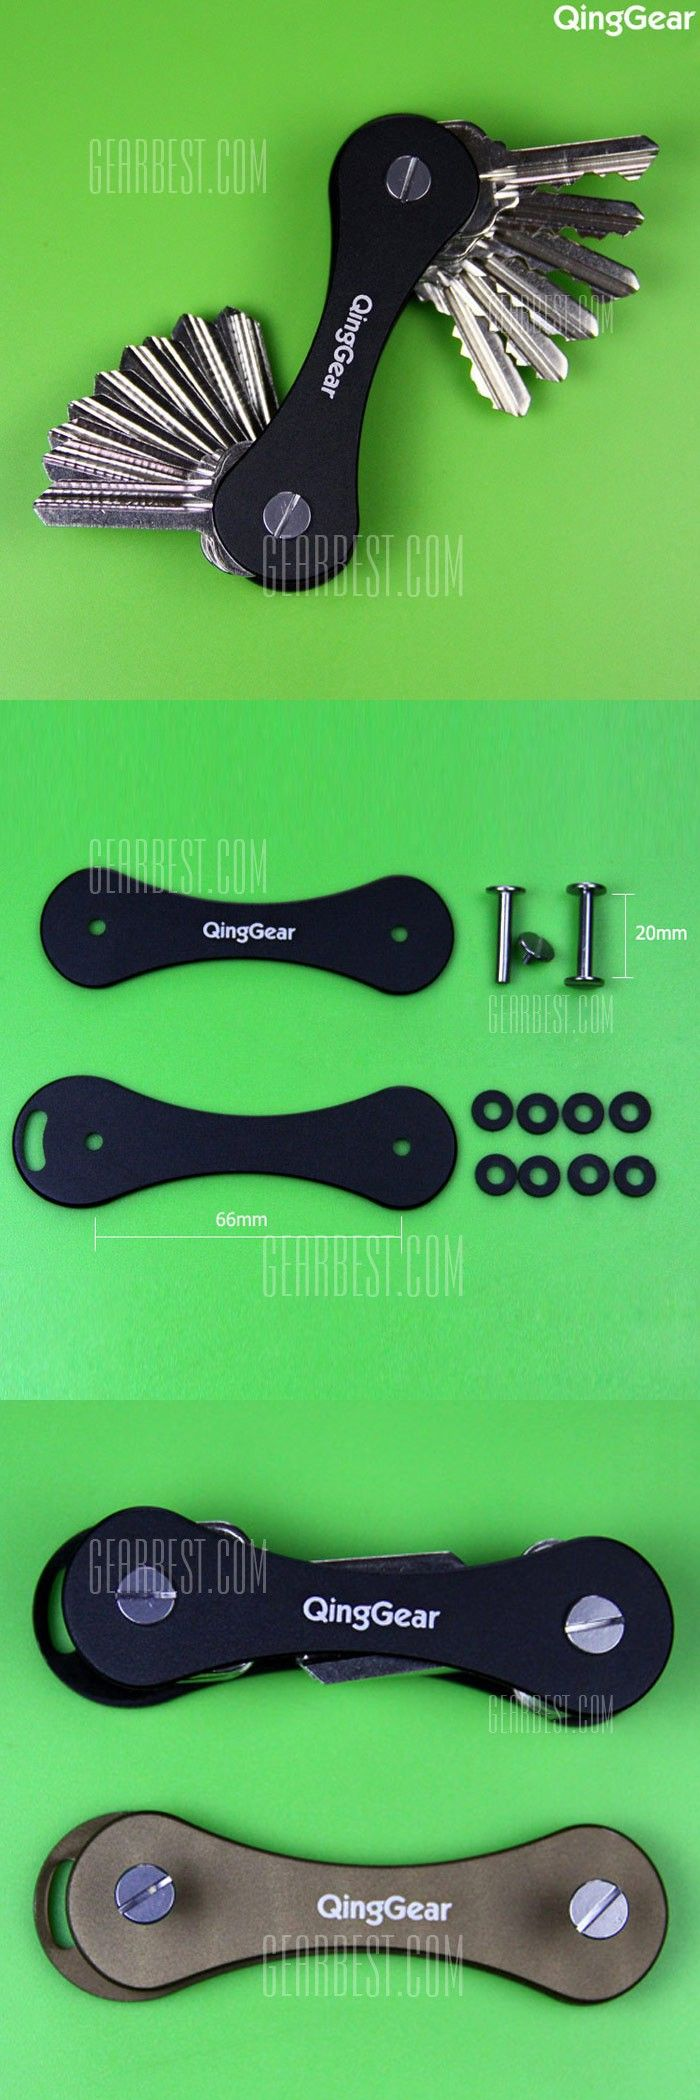 QingGear Creative Bone Shape Keys Organizer Holder Folder Key Chain Clip Pocket Tools - FREE SHIPPING - Price: $4.61 - Buy Now: https://ariani-shop.com/s/153358